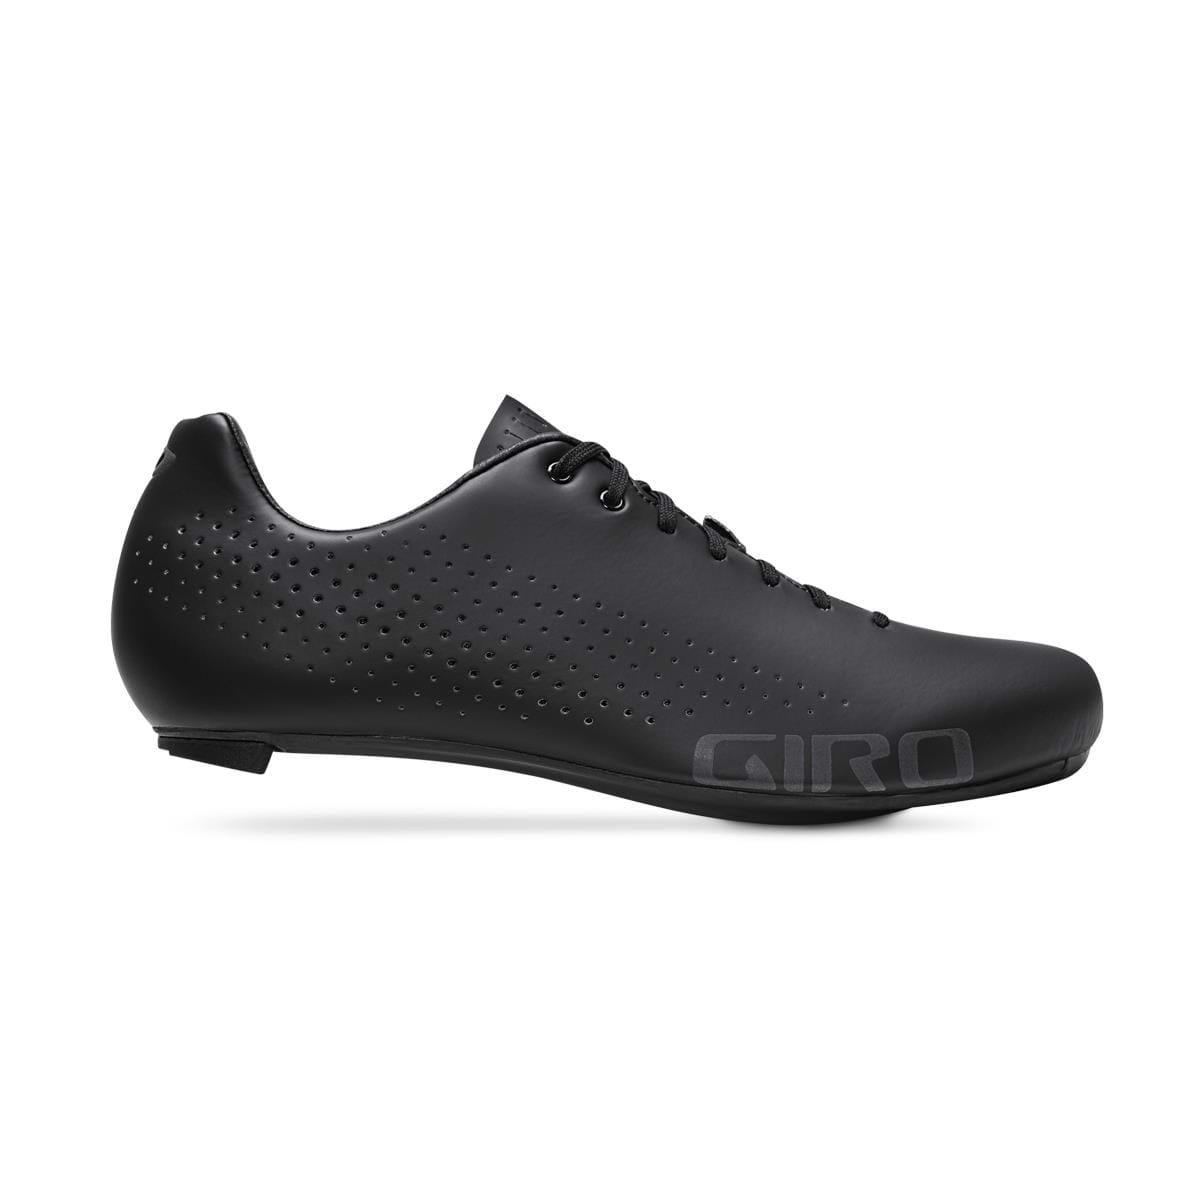 Empire HV Road Cycling Shoe